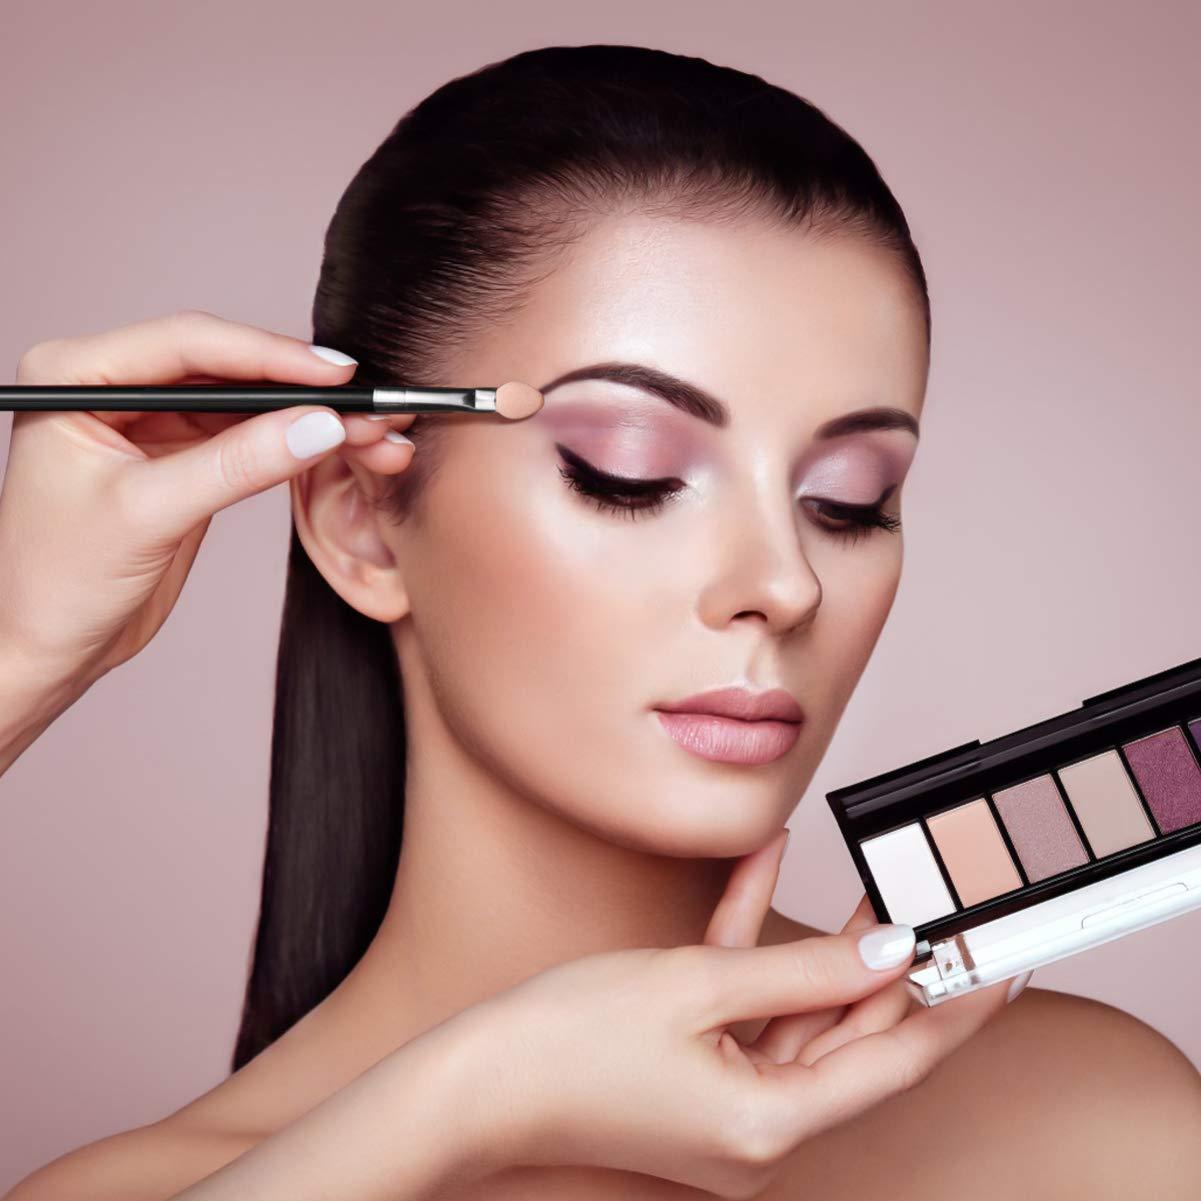 Sponge Eyeshadow Brushes Kit Professional Eye Makeup Applicators Dual Color Smudge Eye Brushes Set, 10pcs